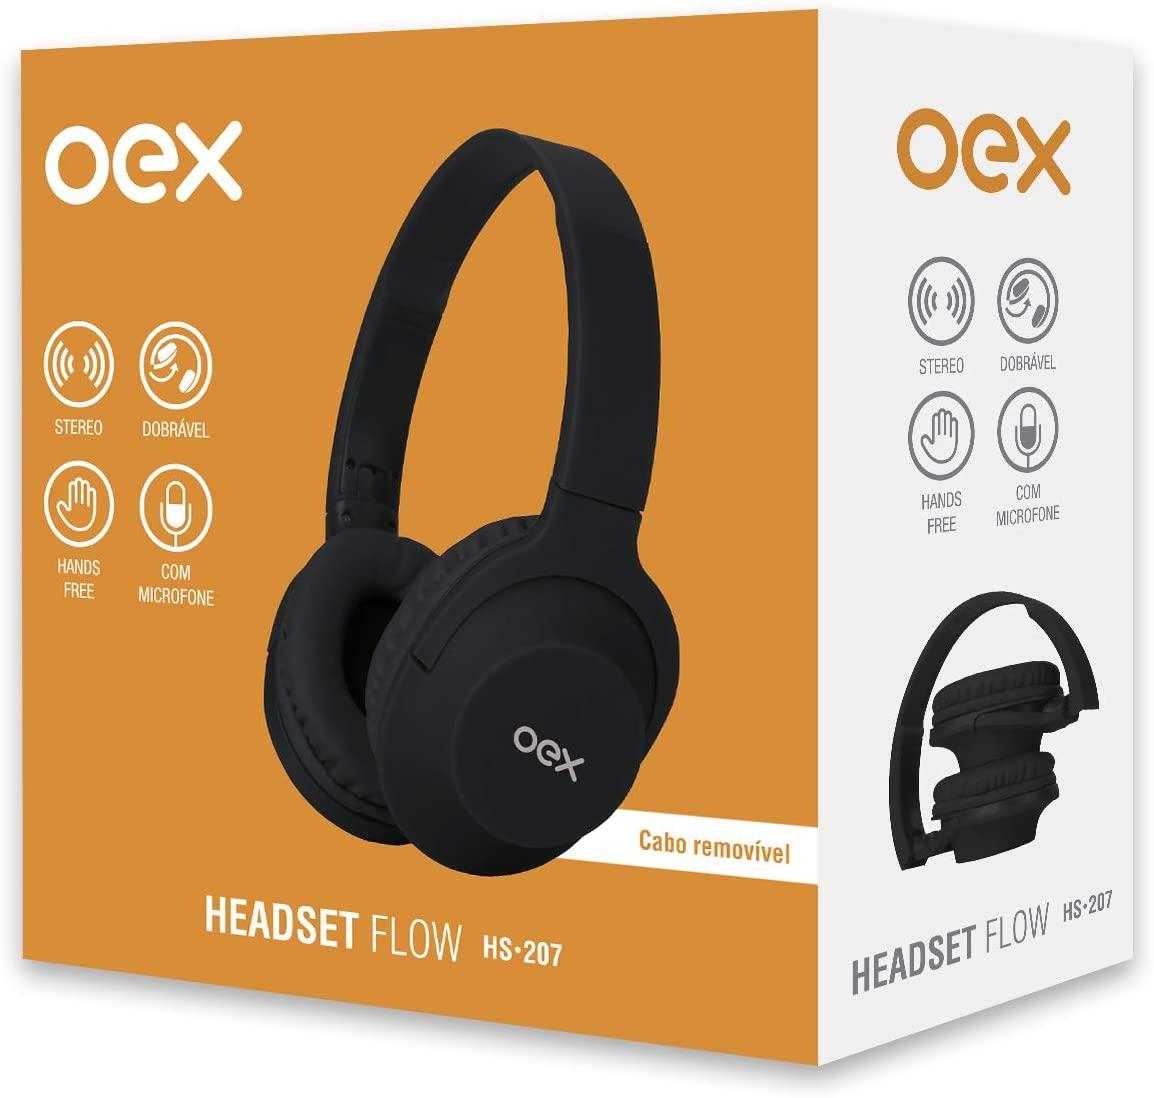 Headset OEX Flow Hs207 Preto